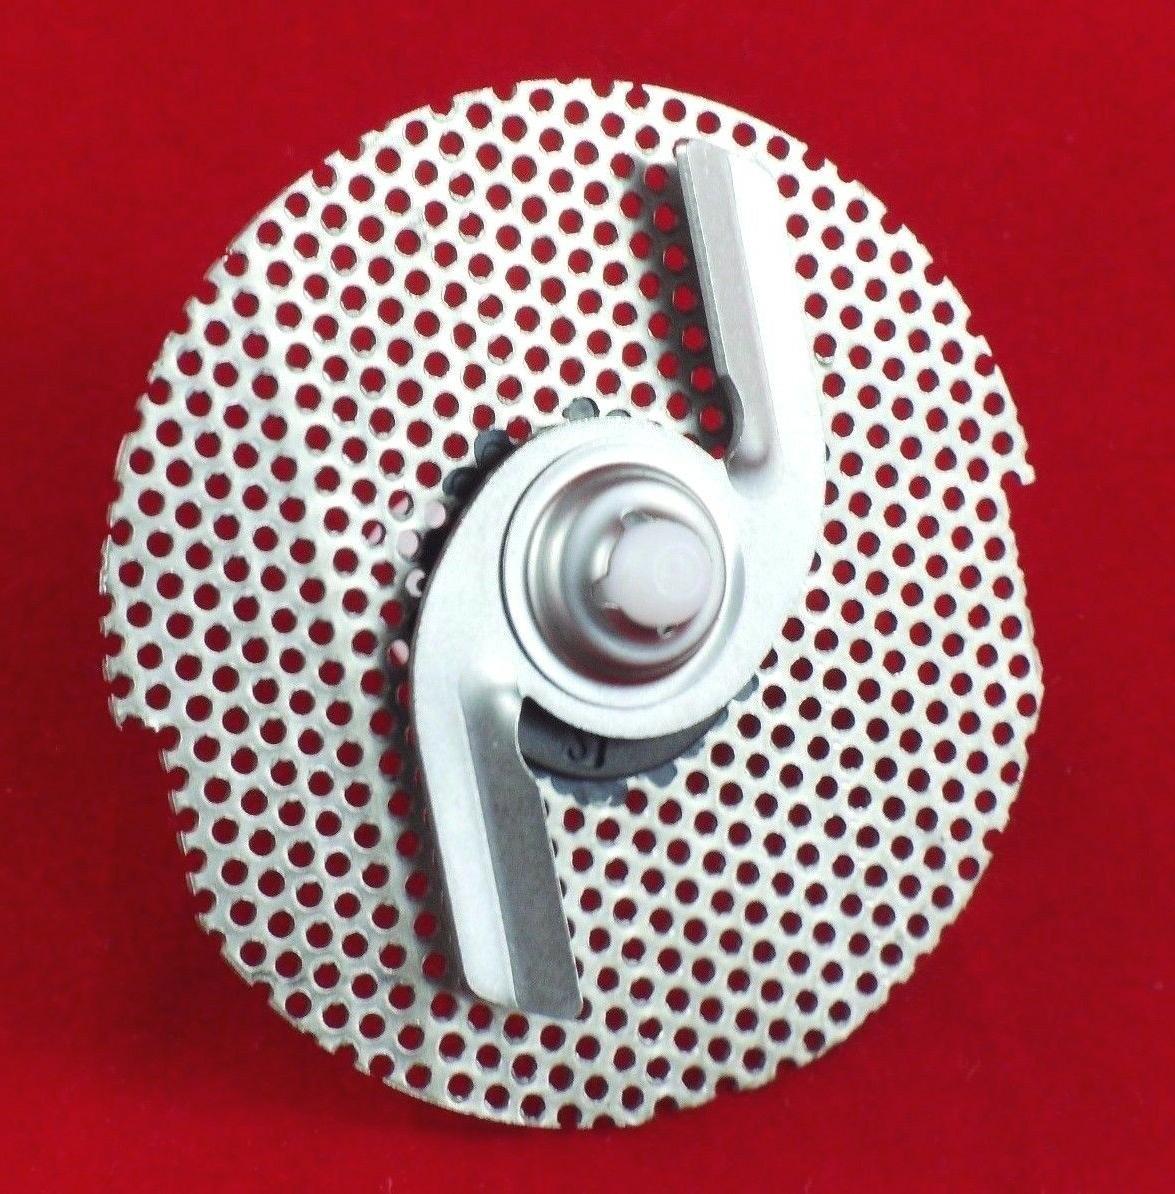 8268383 maytag dishwasher chopper blade assembly new